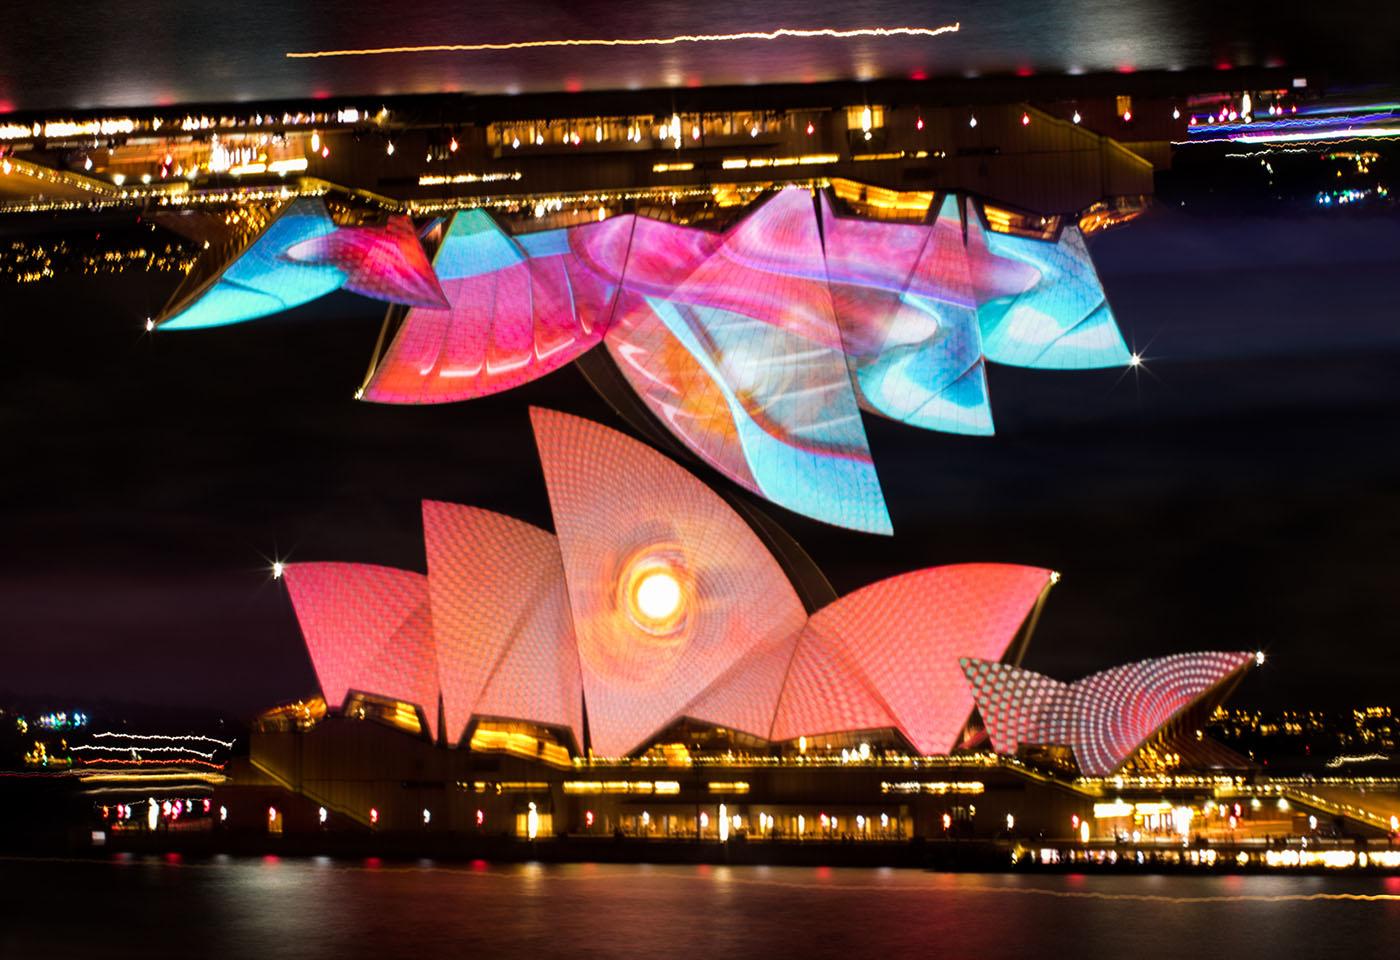 Multiple exposure image of the Sydney Opera House